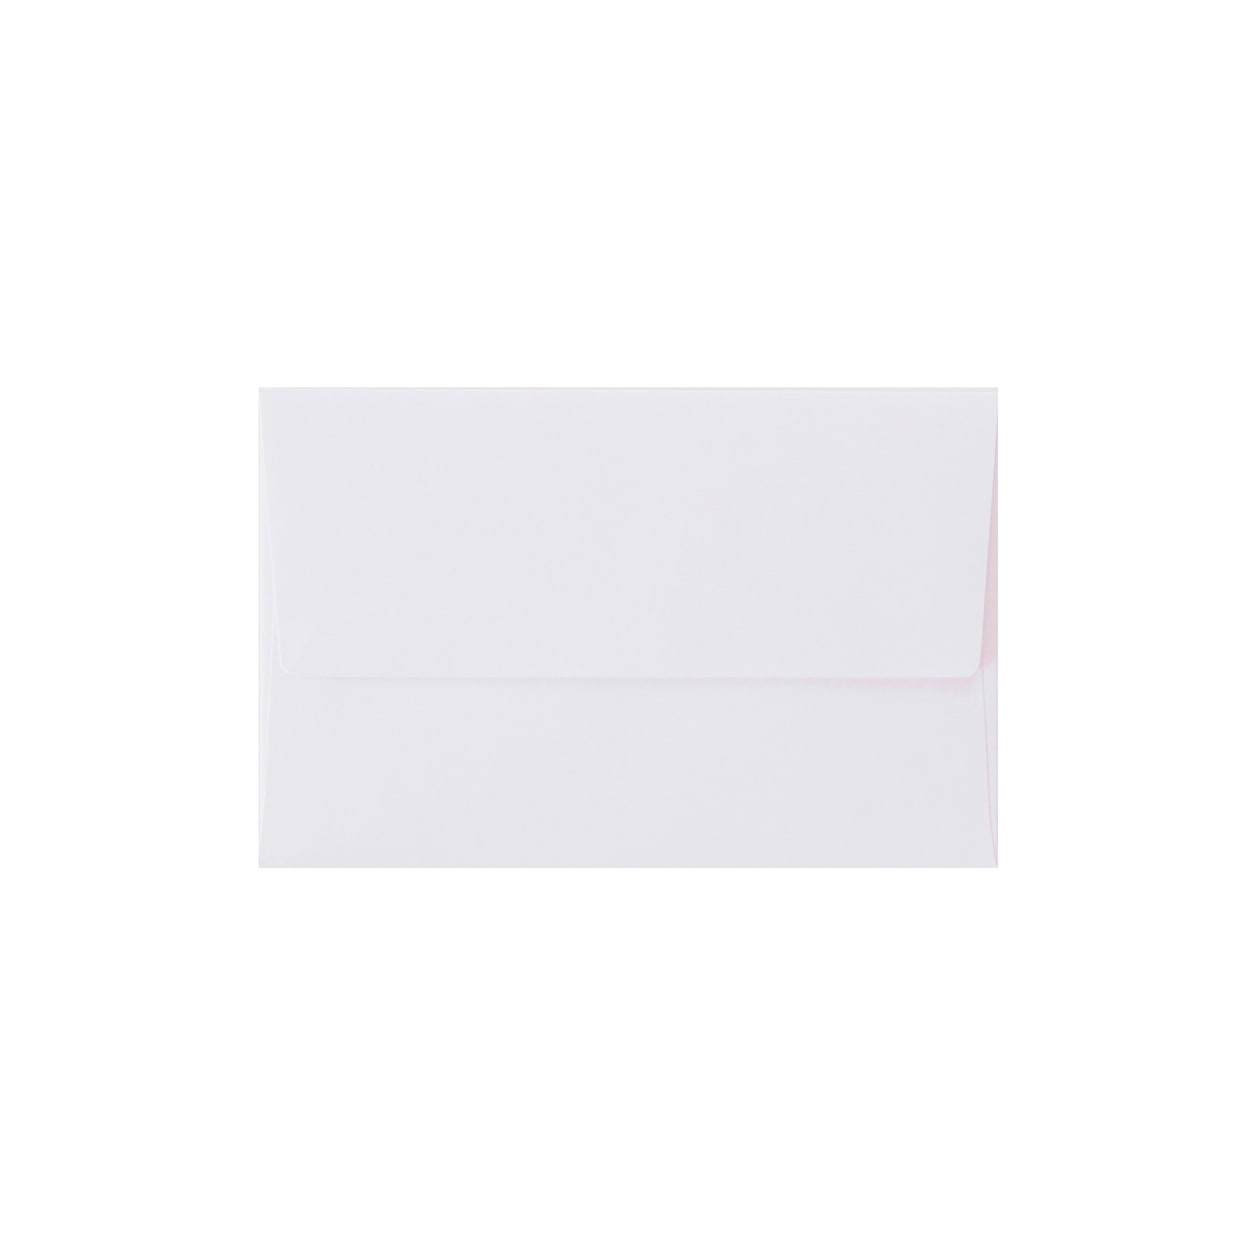 NEカマス封筒 上質カラー ホワイト 90.7g